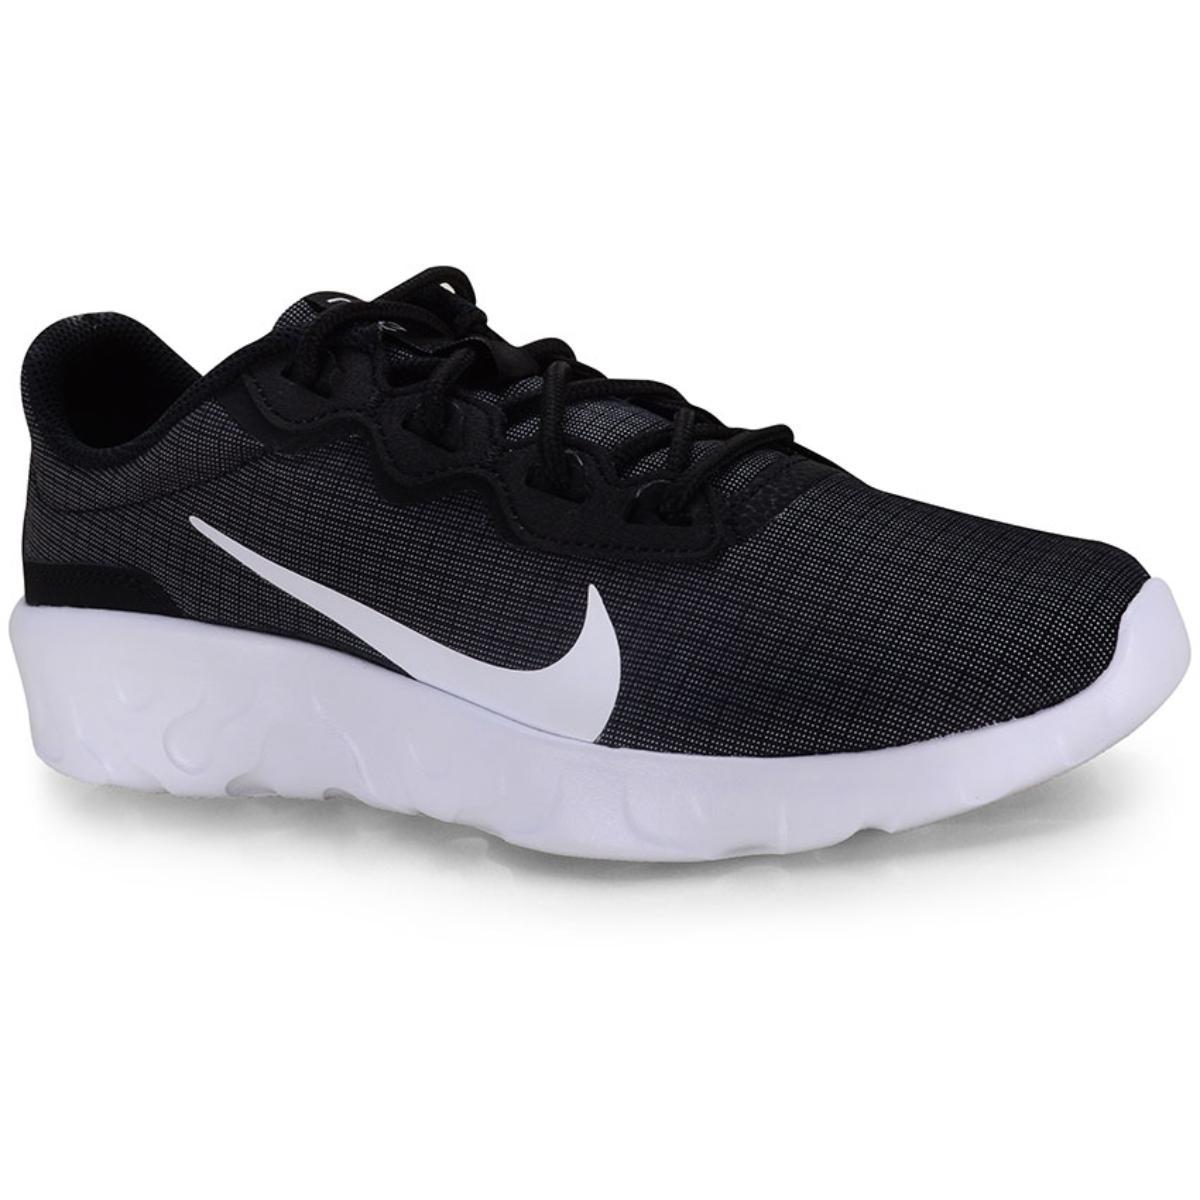 Tênis Masculino Nike Cd7093-001 Explore Strada Preto/branco